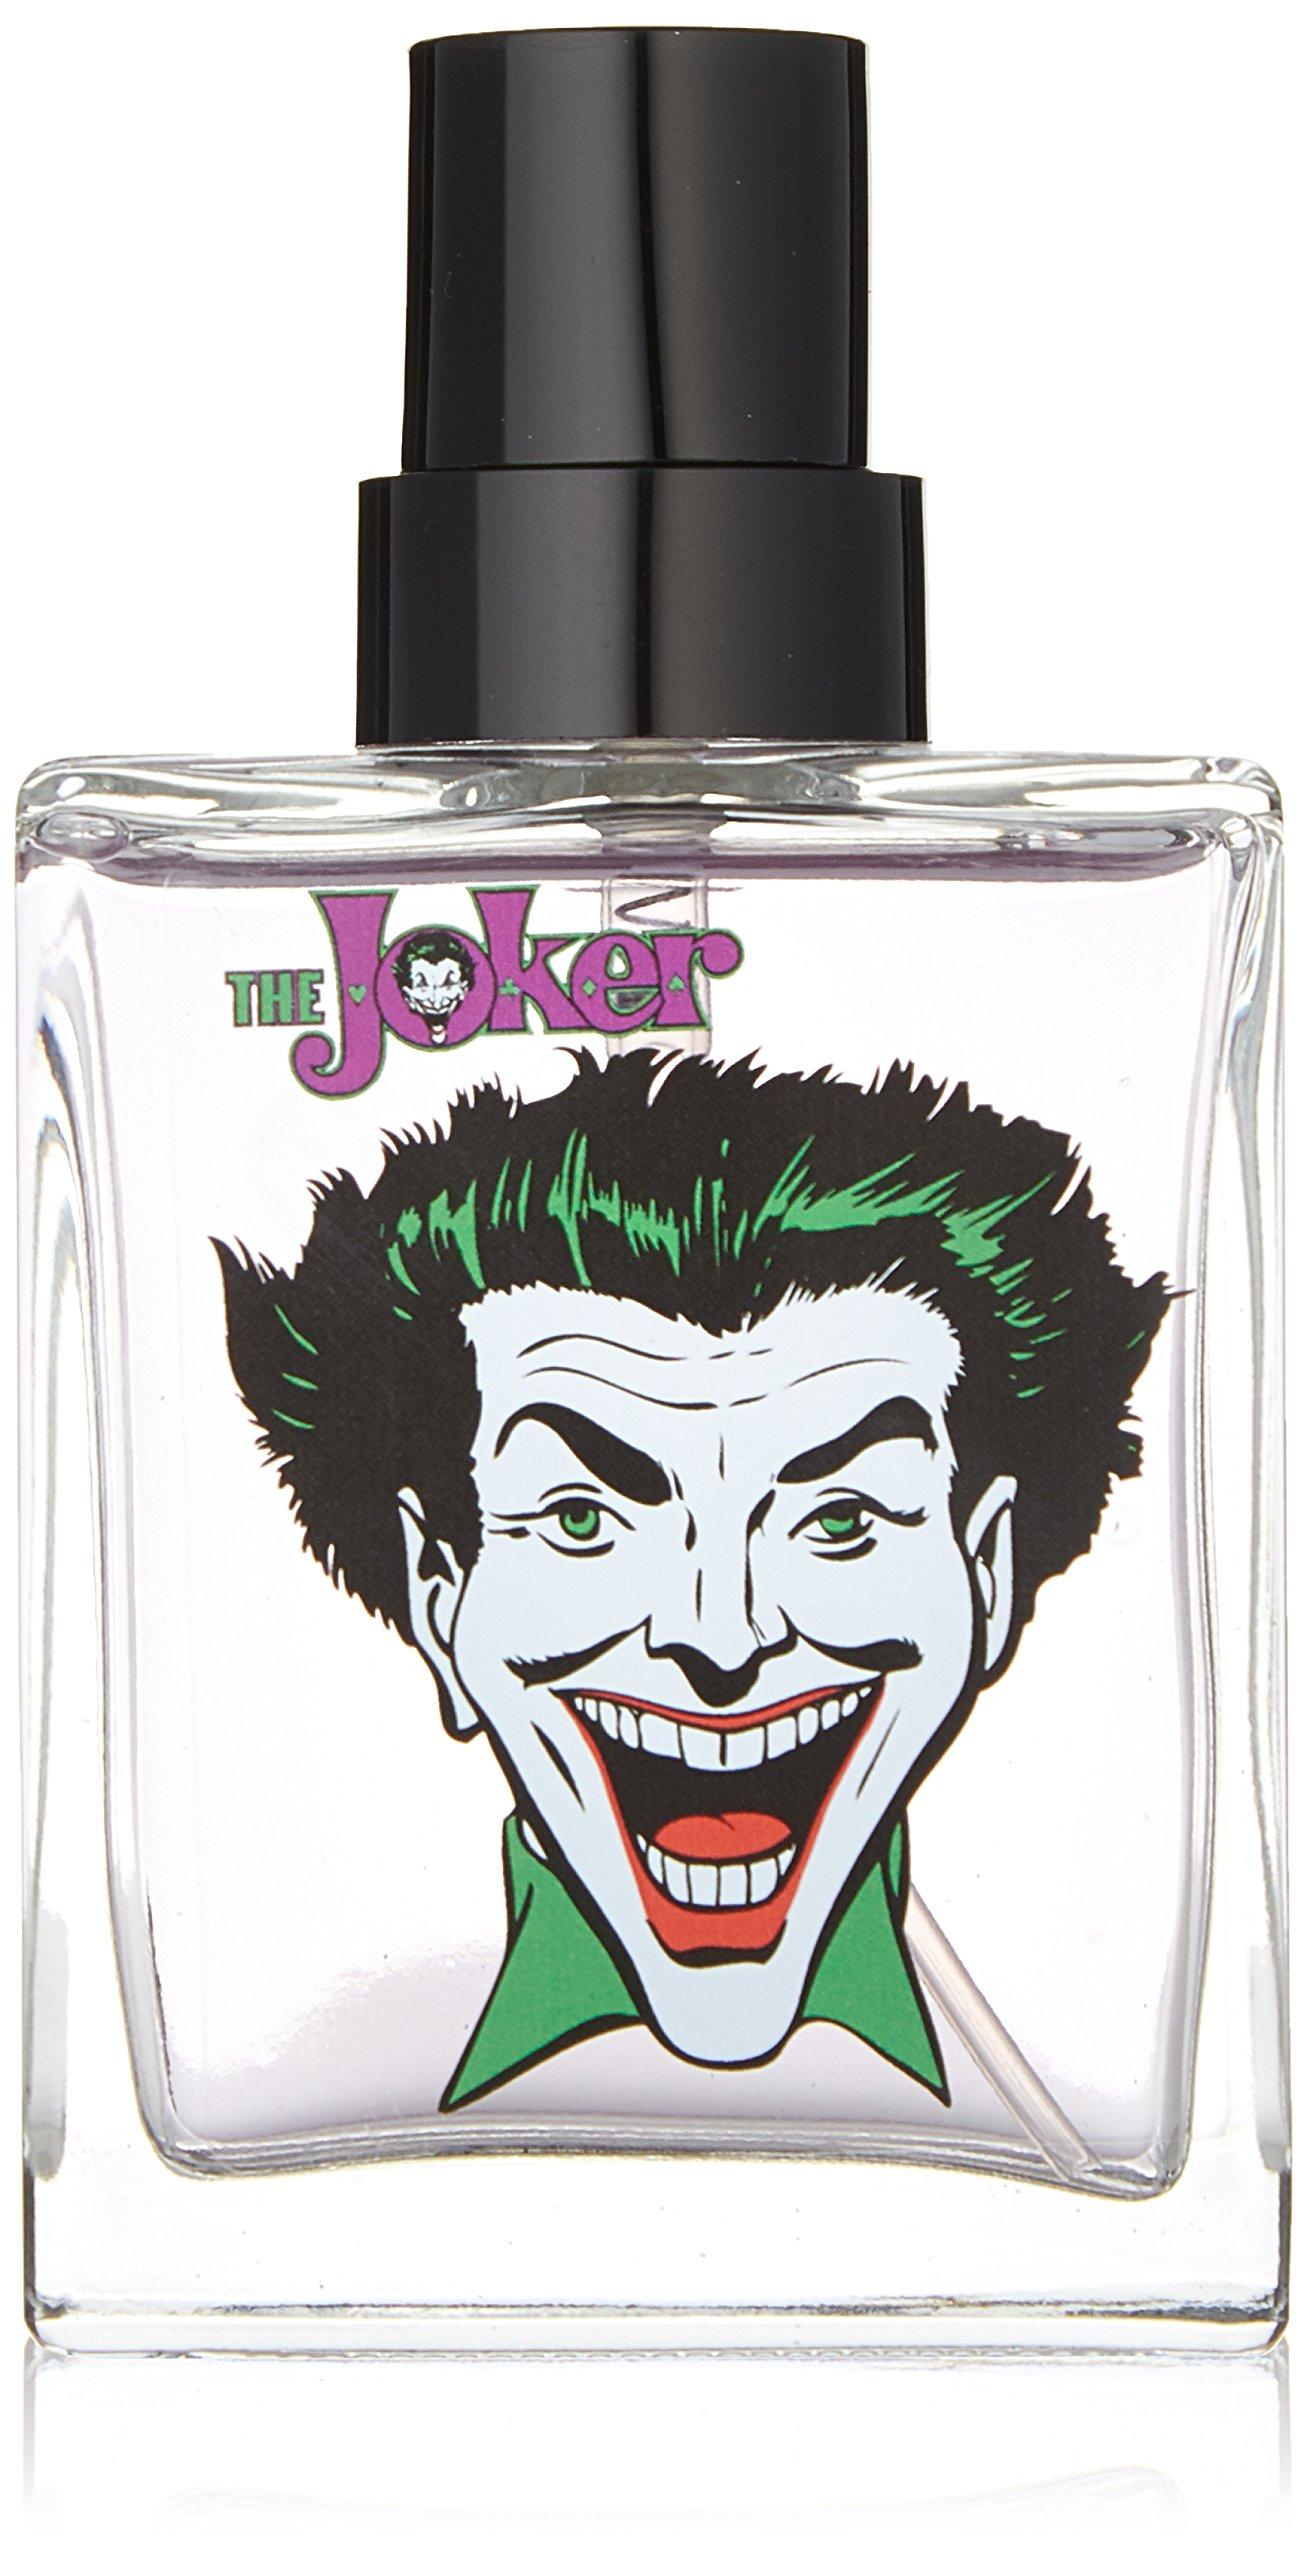 Marmol & Son Kids The Joker Perfume, 3.4 Ounce